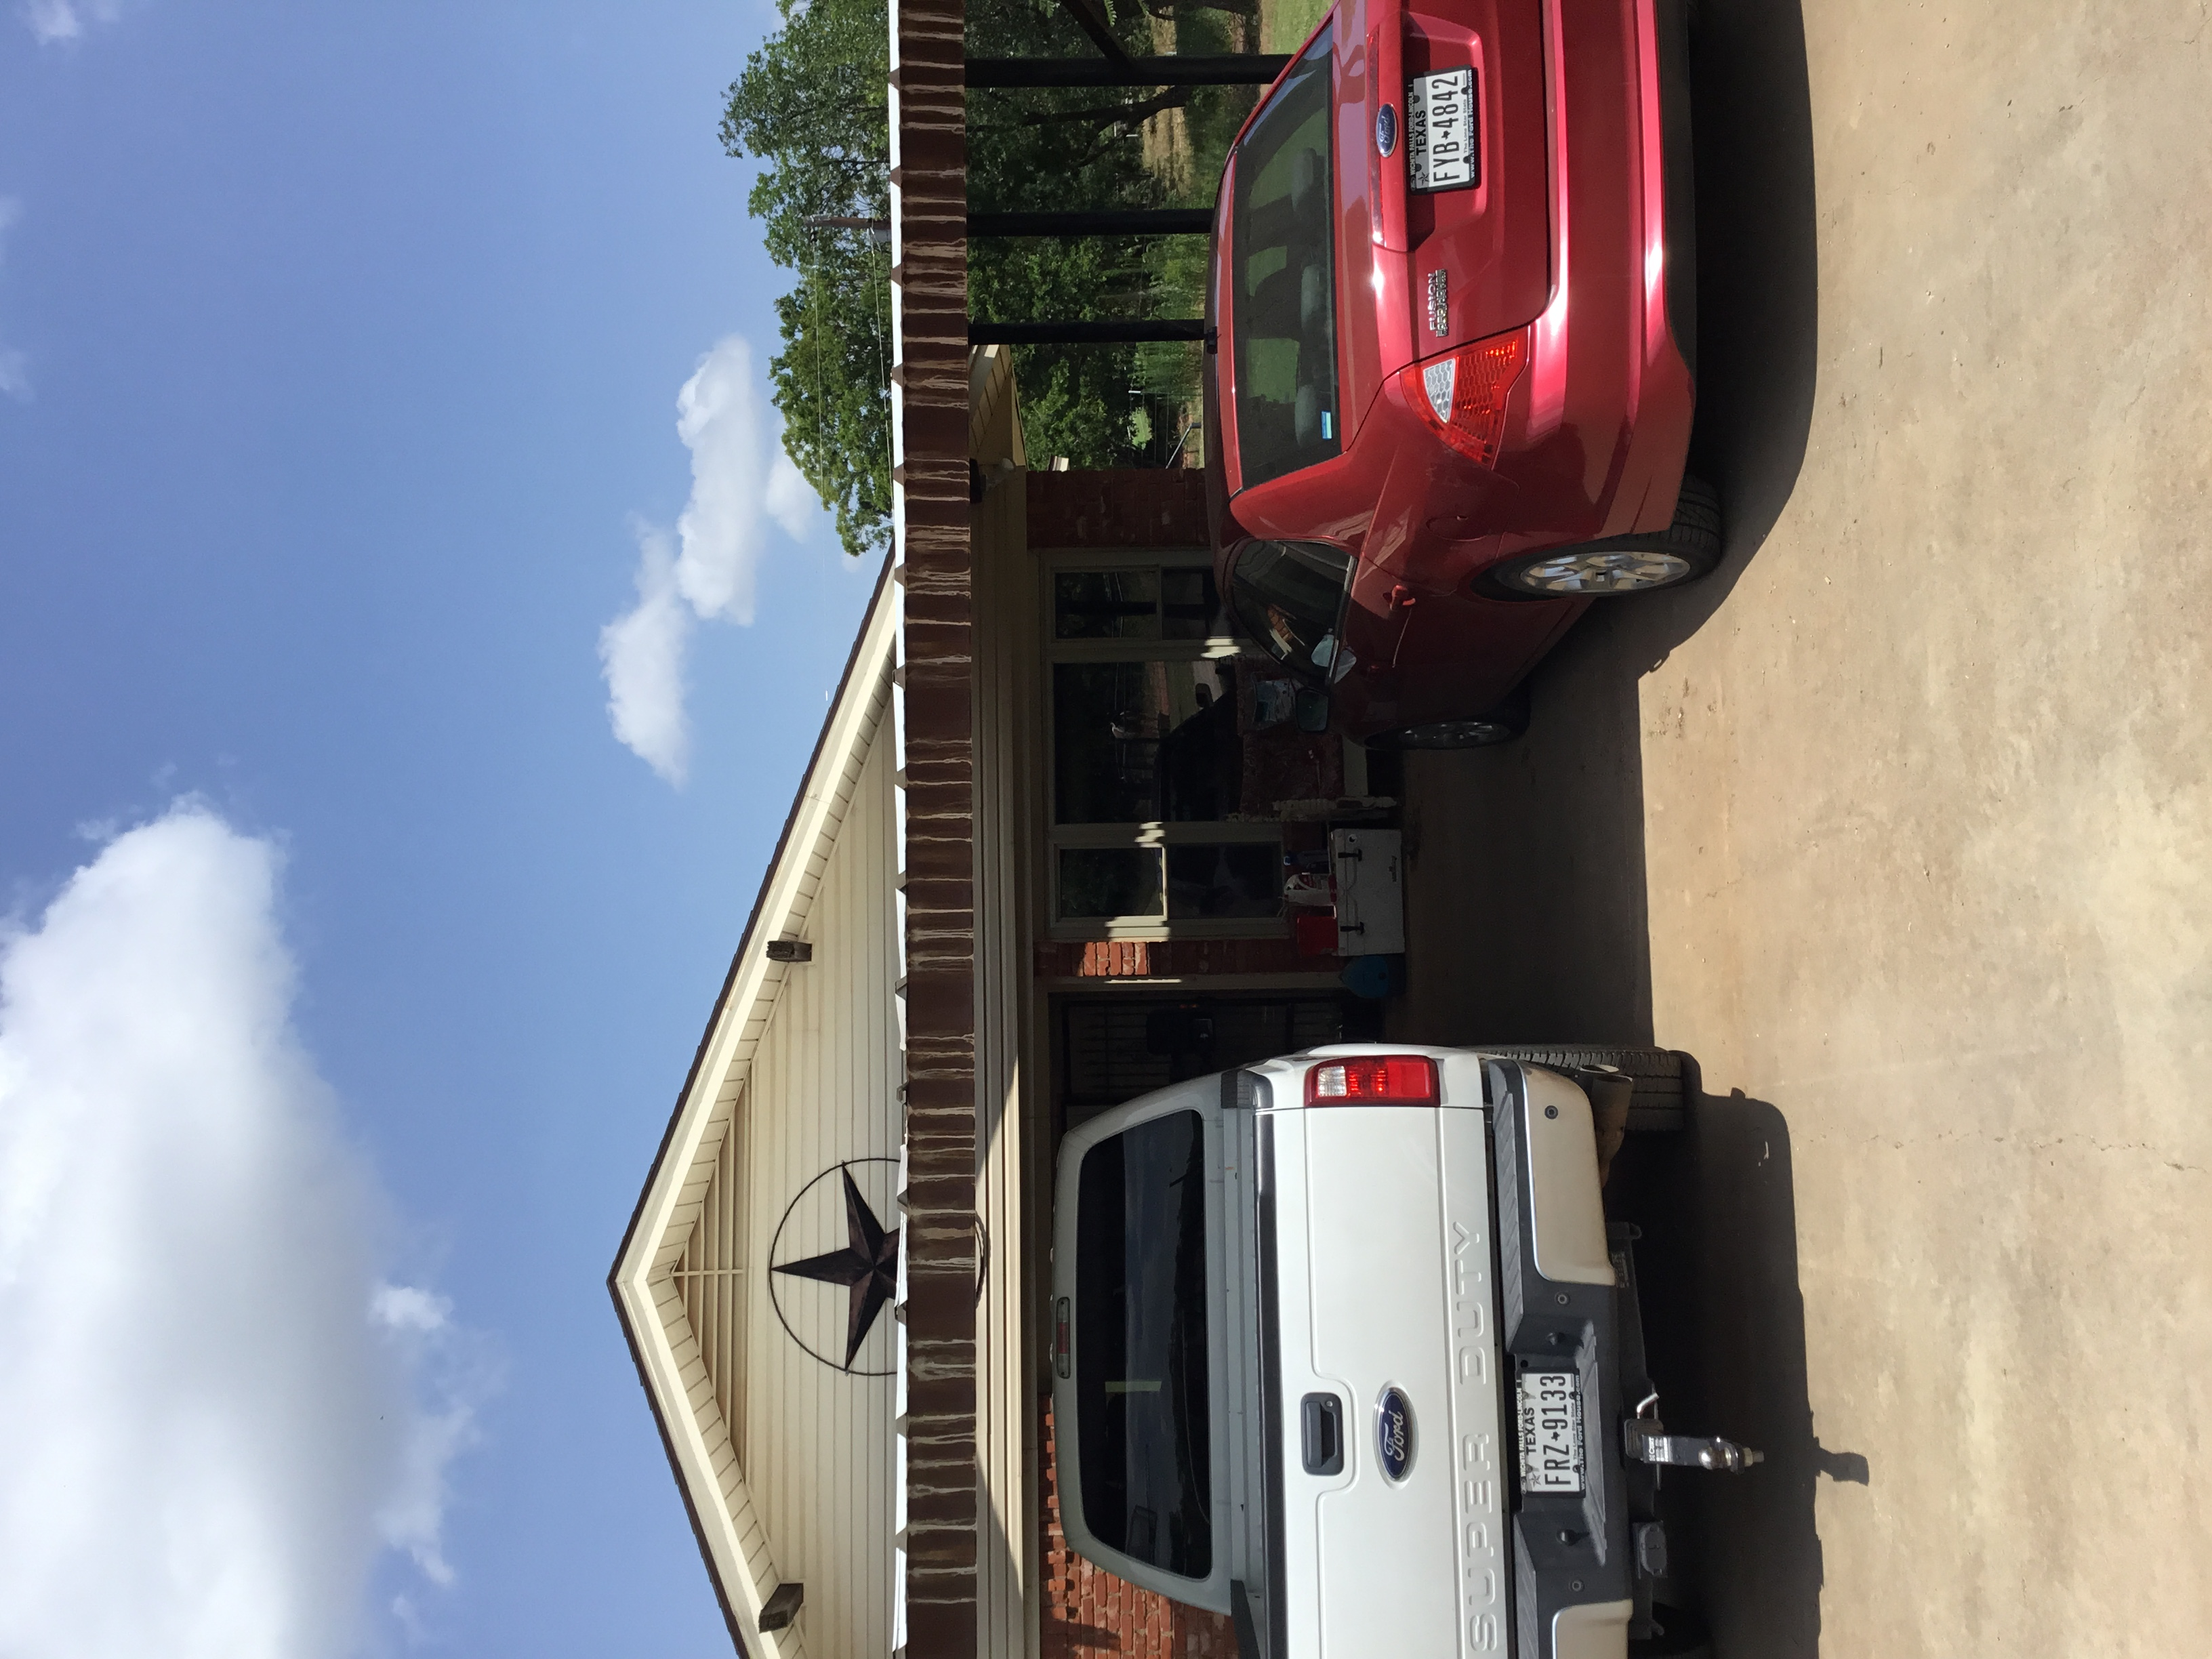 Ford House Wichita Falls Tx >> 5014 Lb Dr Wichita Falls Tx 76310 Realestate Com